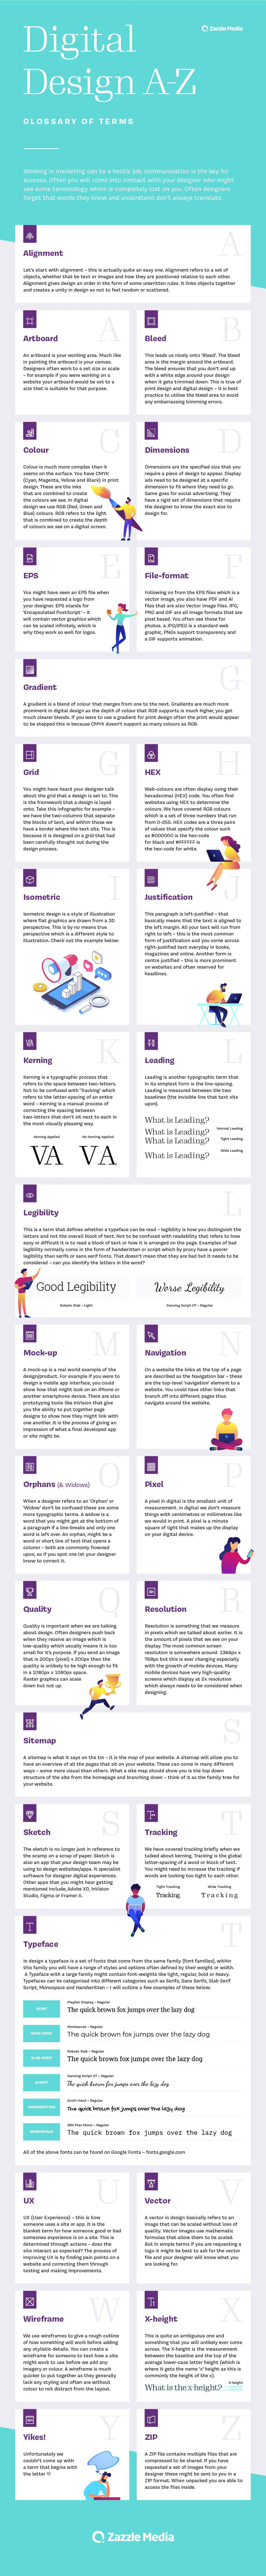 digital design glossary